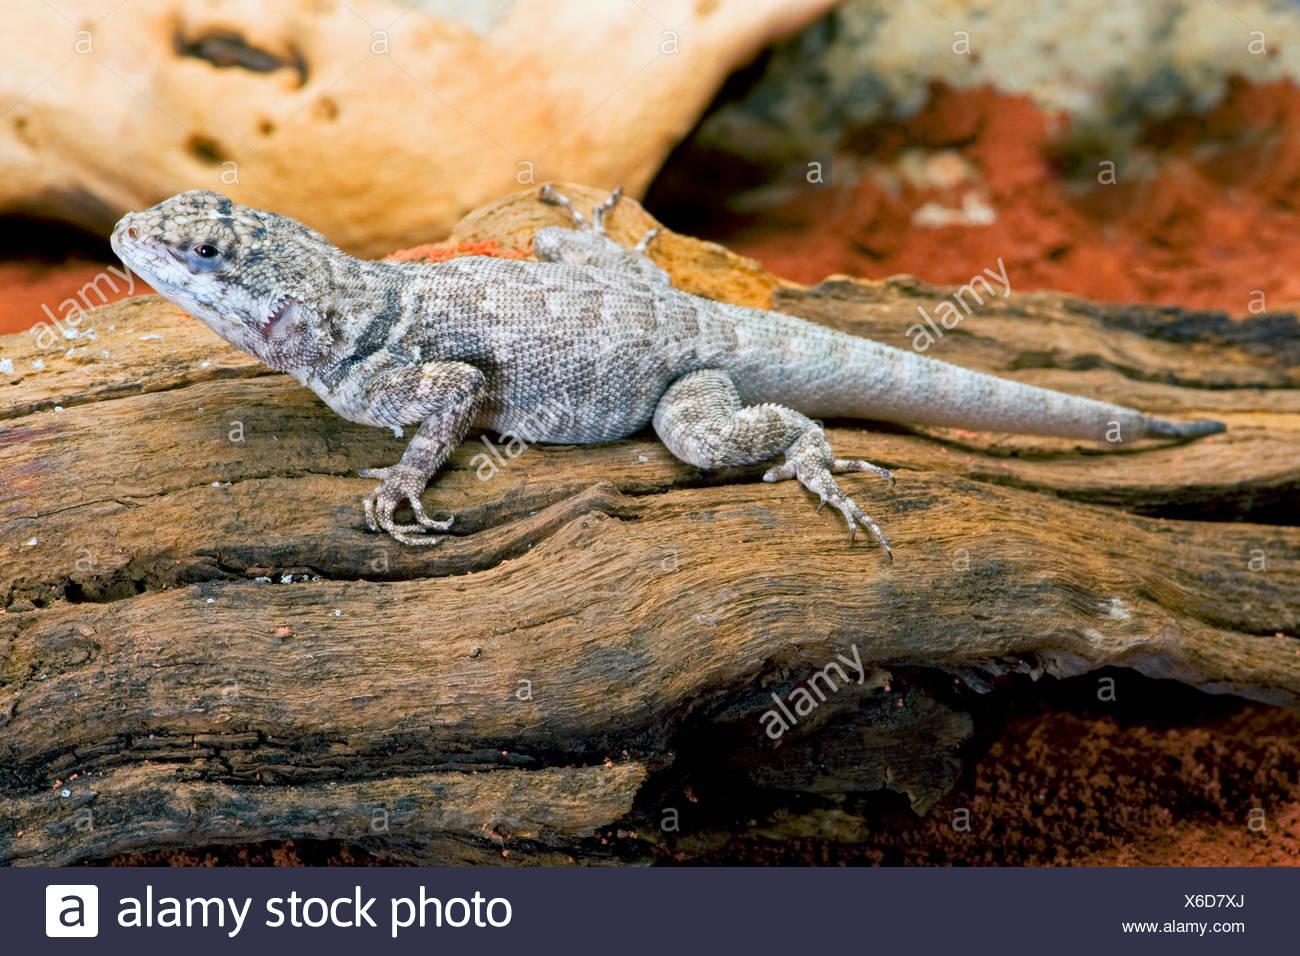 Amazon Lava Lizard (Tropidurus torquatus), sitting on deadwood - Stock Image